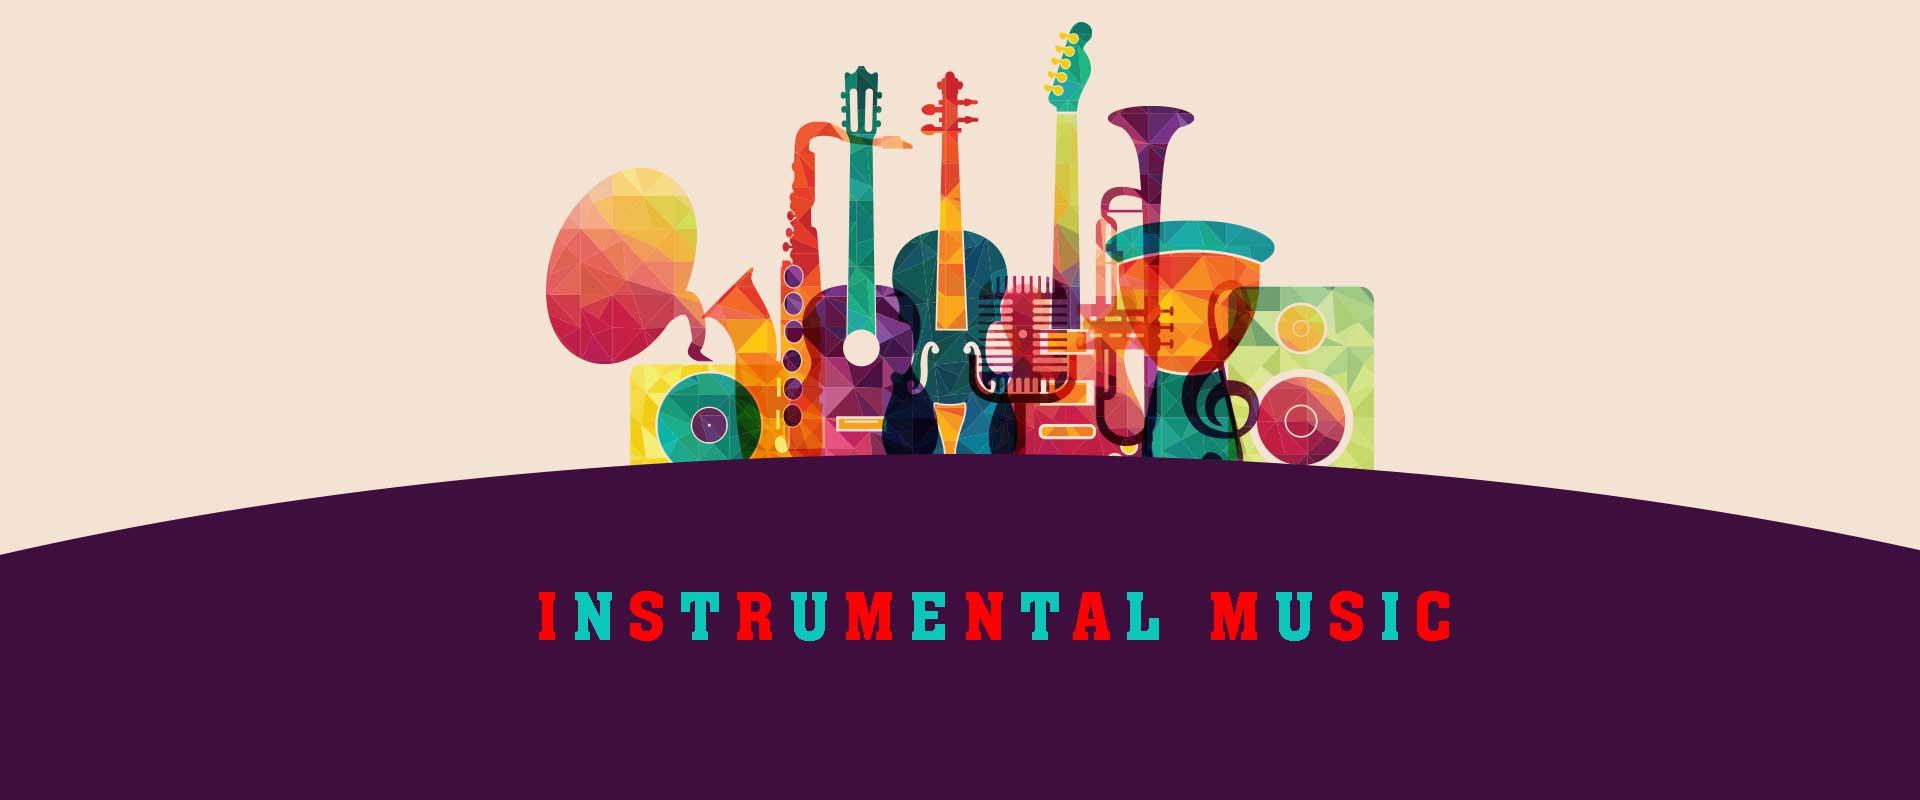 Instrumental-Music.jpg